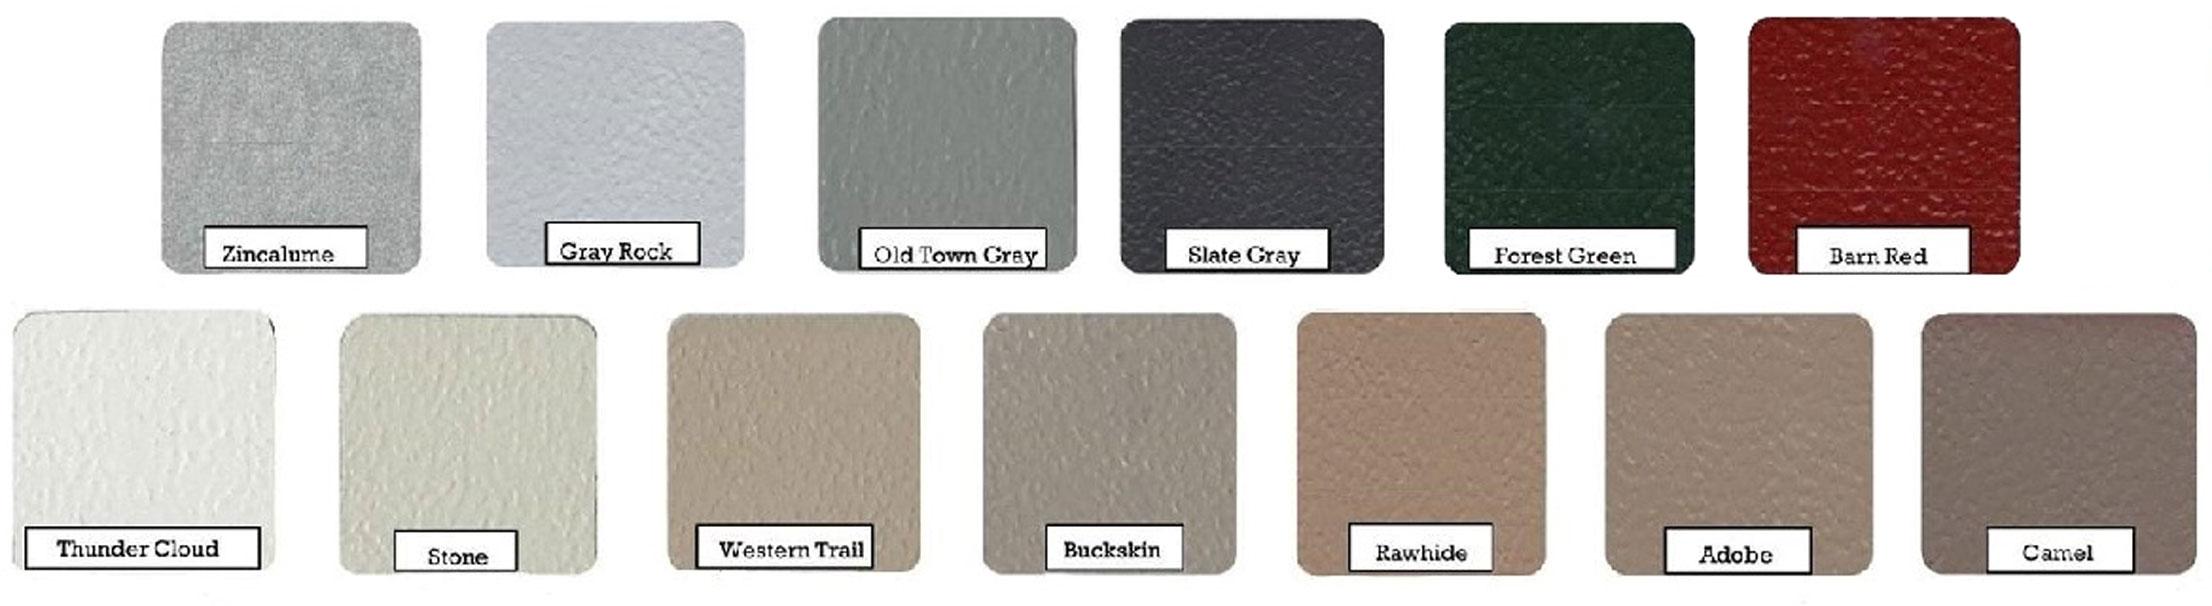 barn wall colors